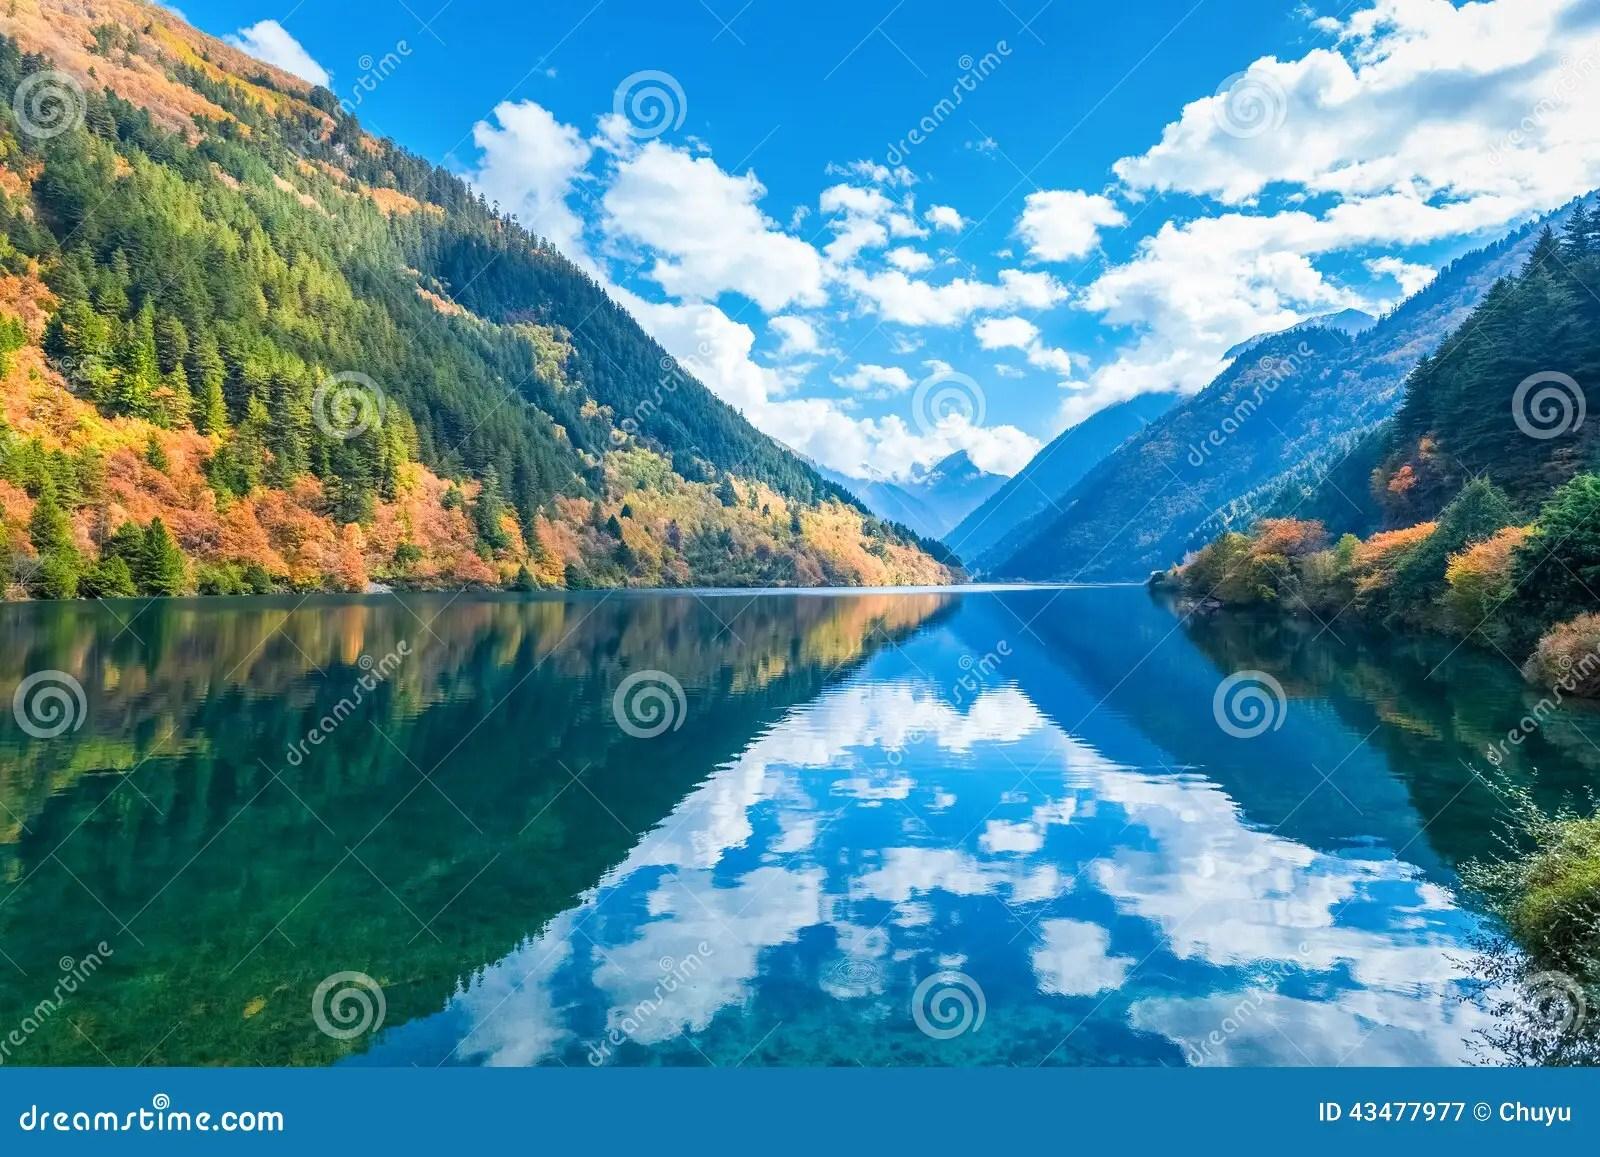 Fall Lake Wallpaper Beautiful Rhino Lake In Autumn Jiuzhaigou Stock Image